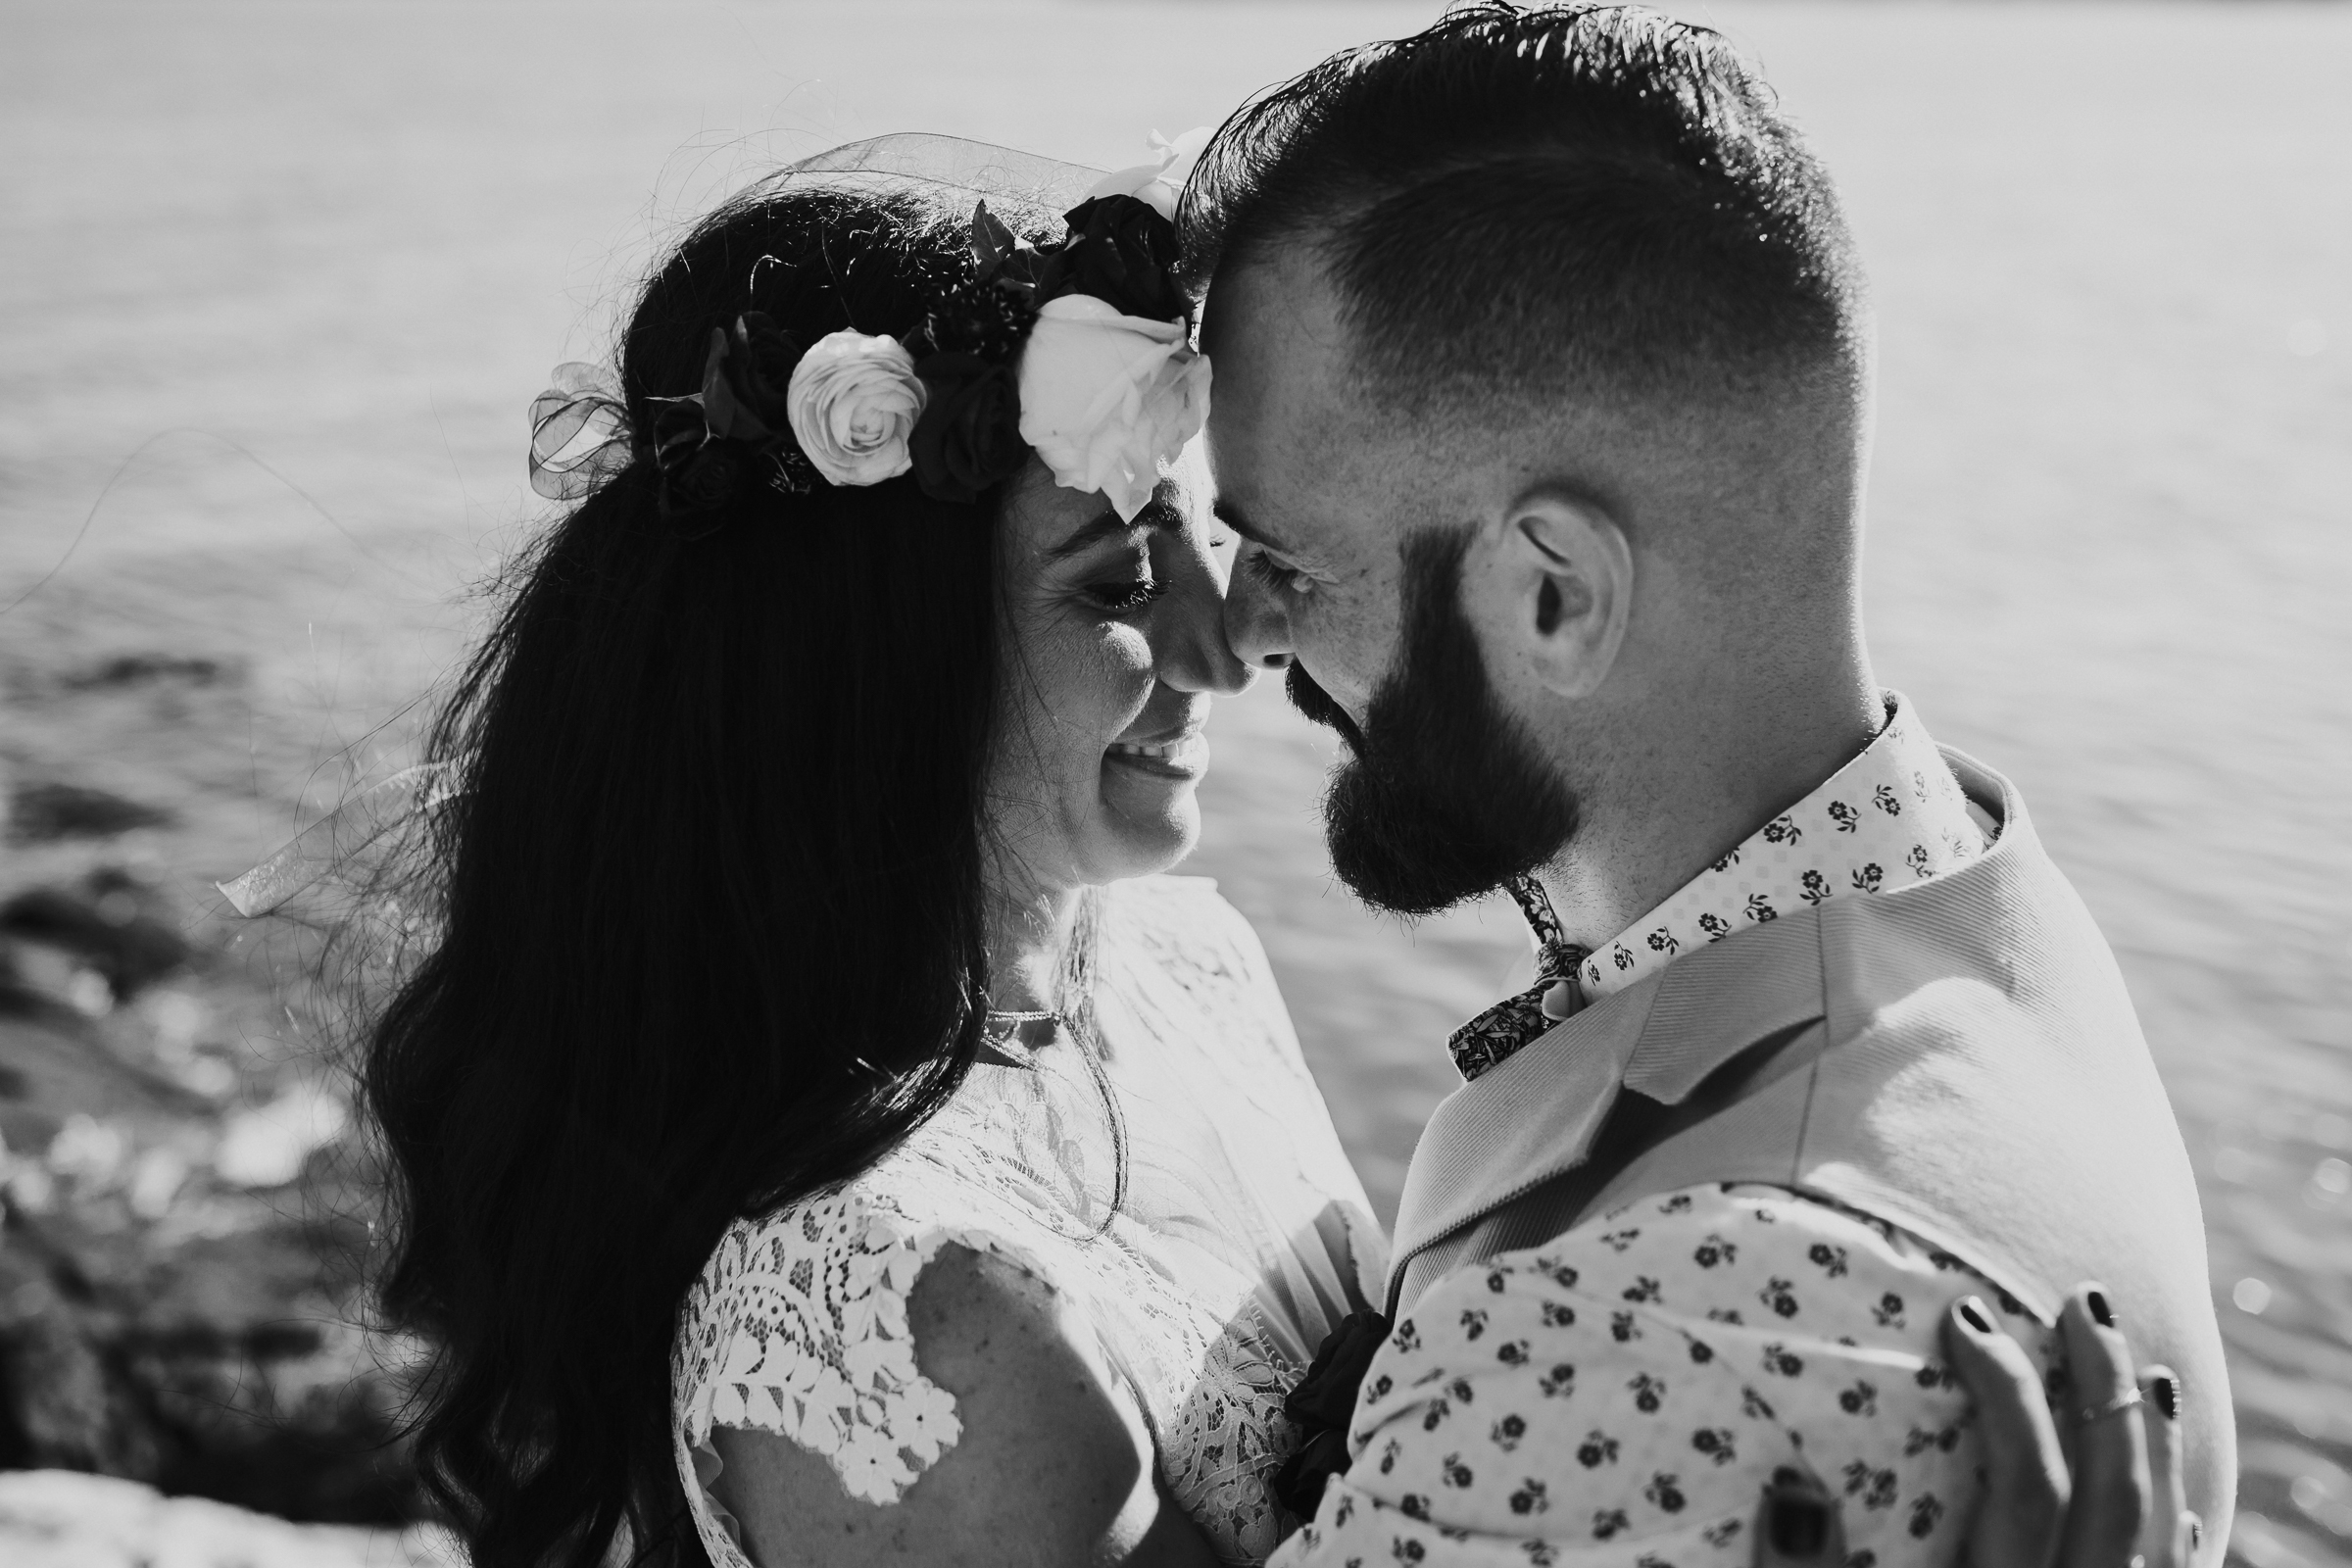 Backyard-Intimate-Adventurous-Destination-Wedding-Darien-Connecticut-Documentary-Wedding-Photography-85.jpg